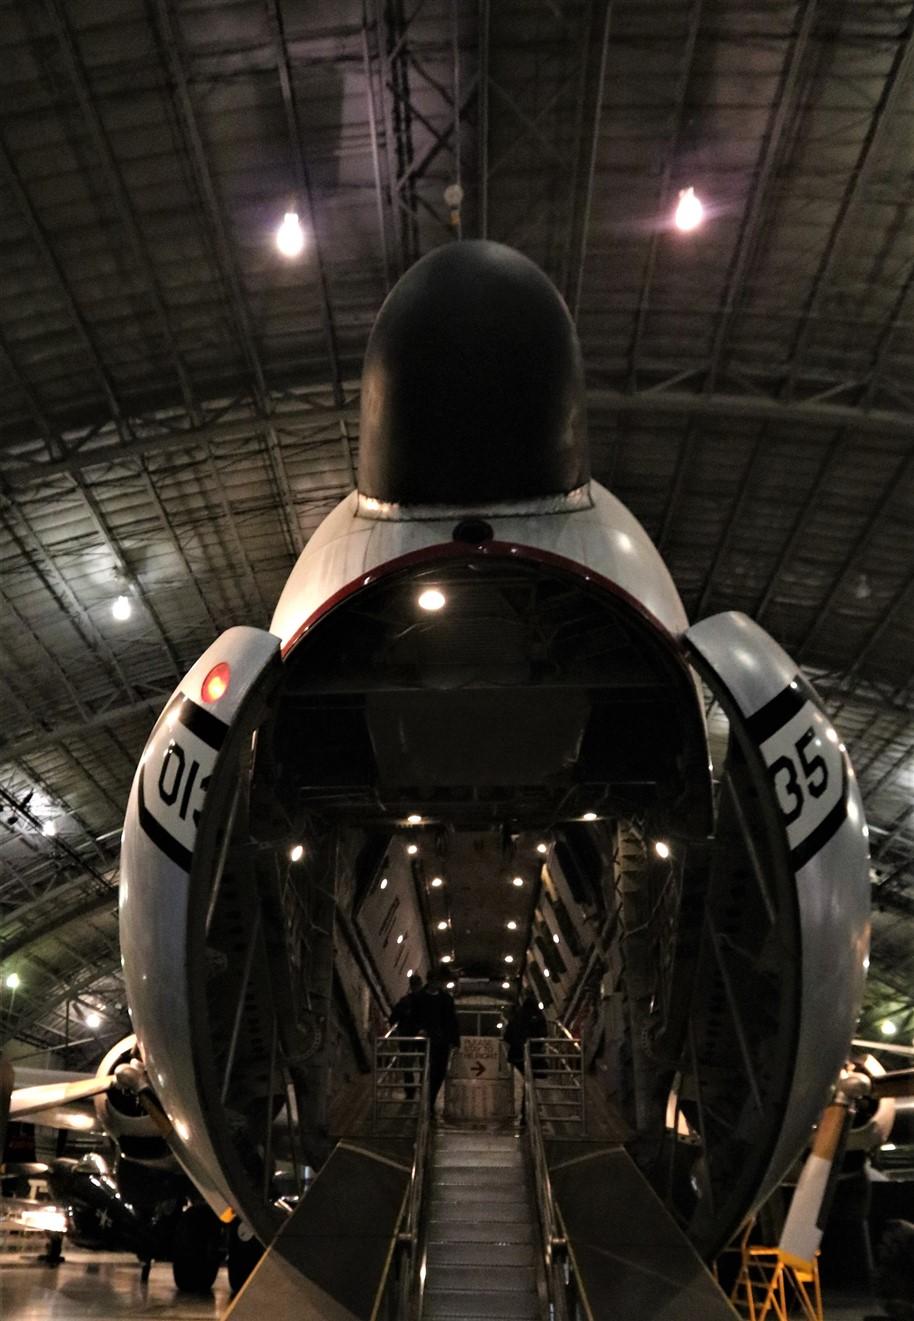 2018 01 06 131 Dayton USAF Museum.jpg